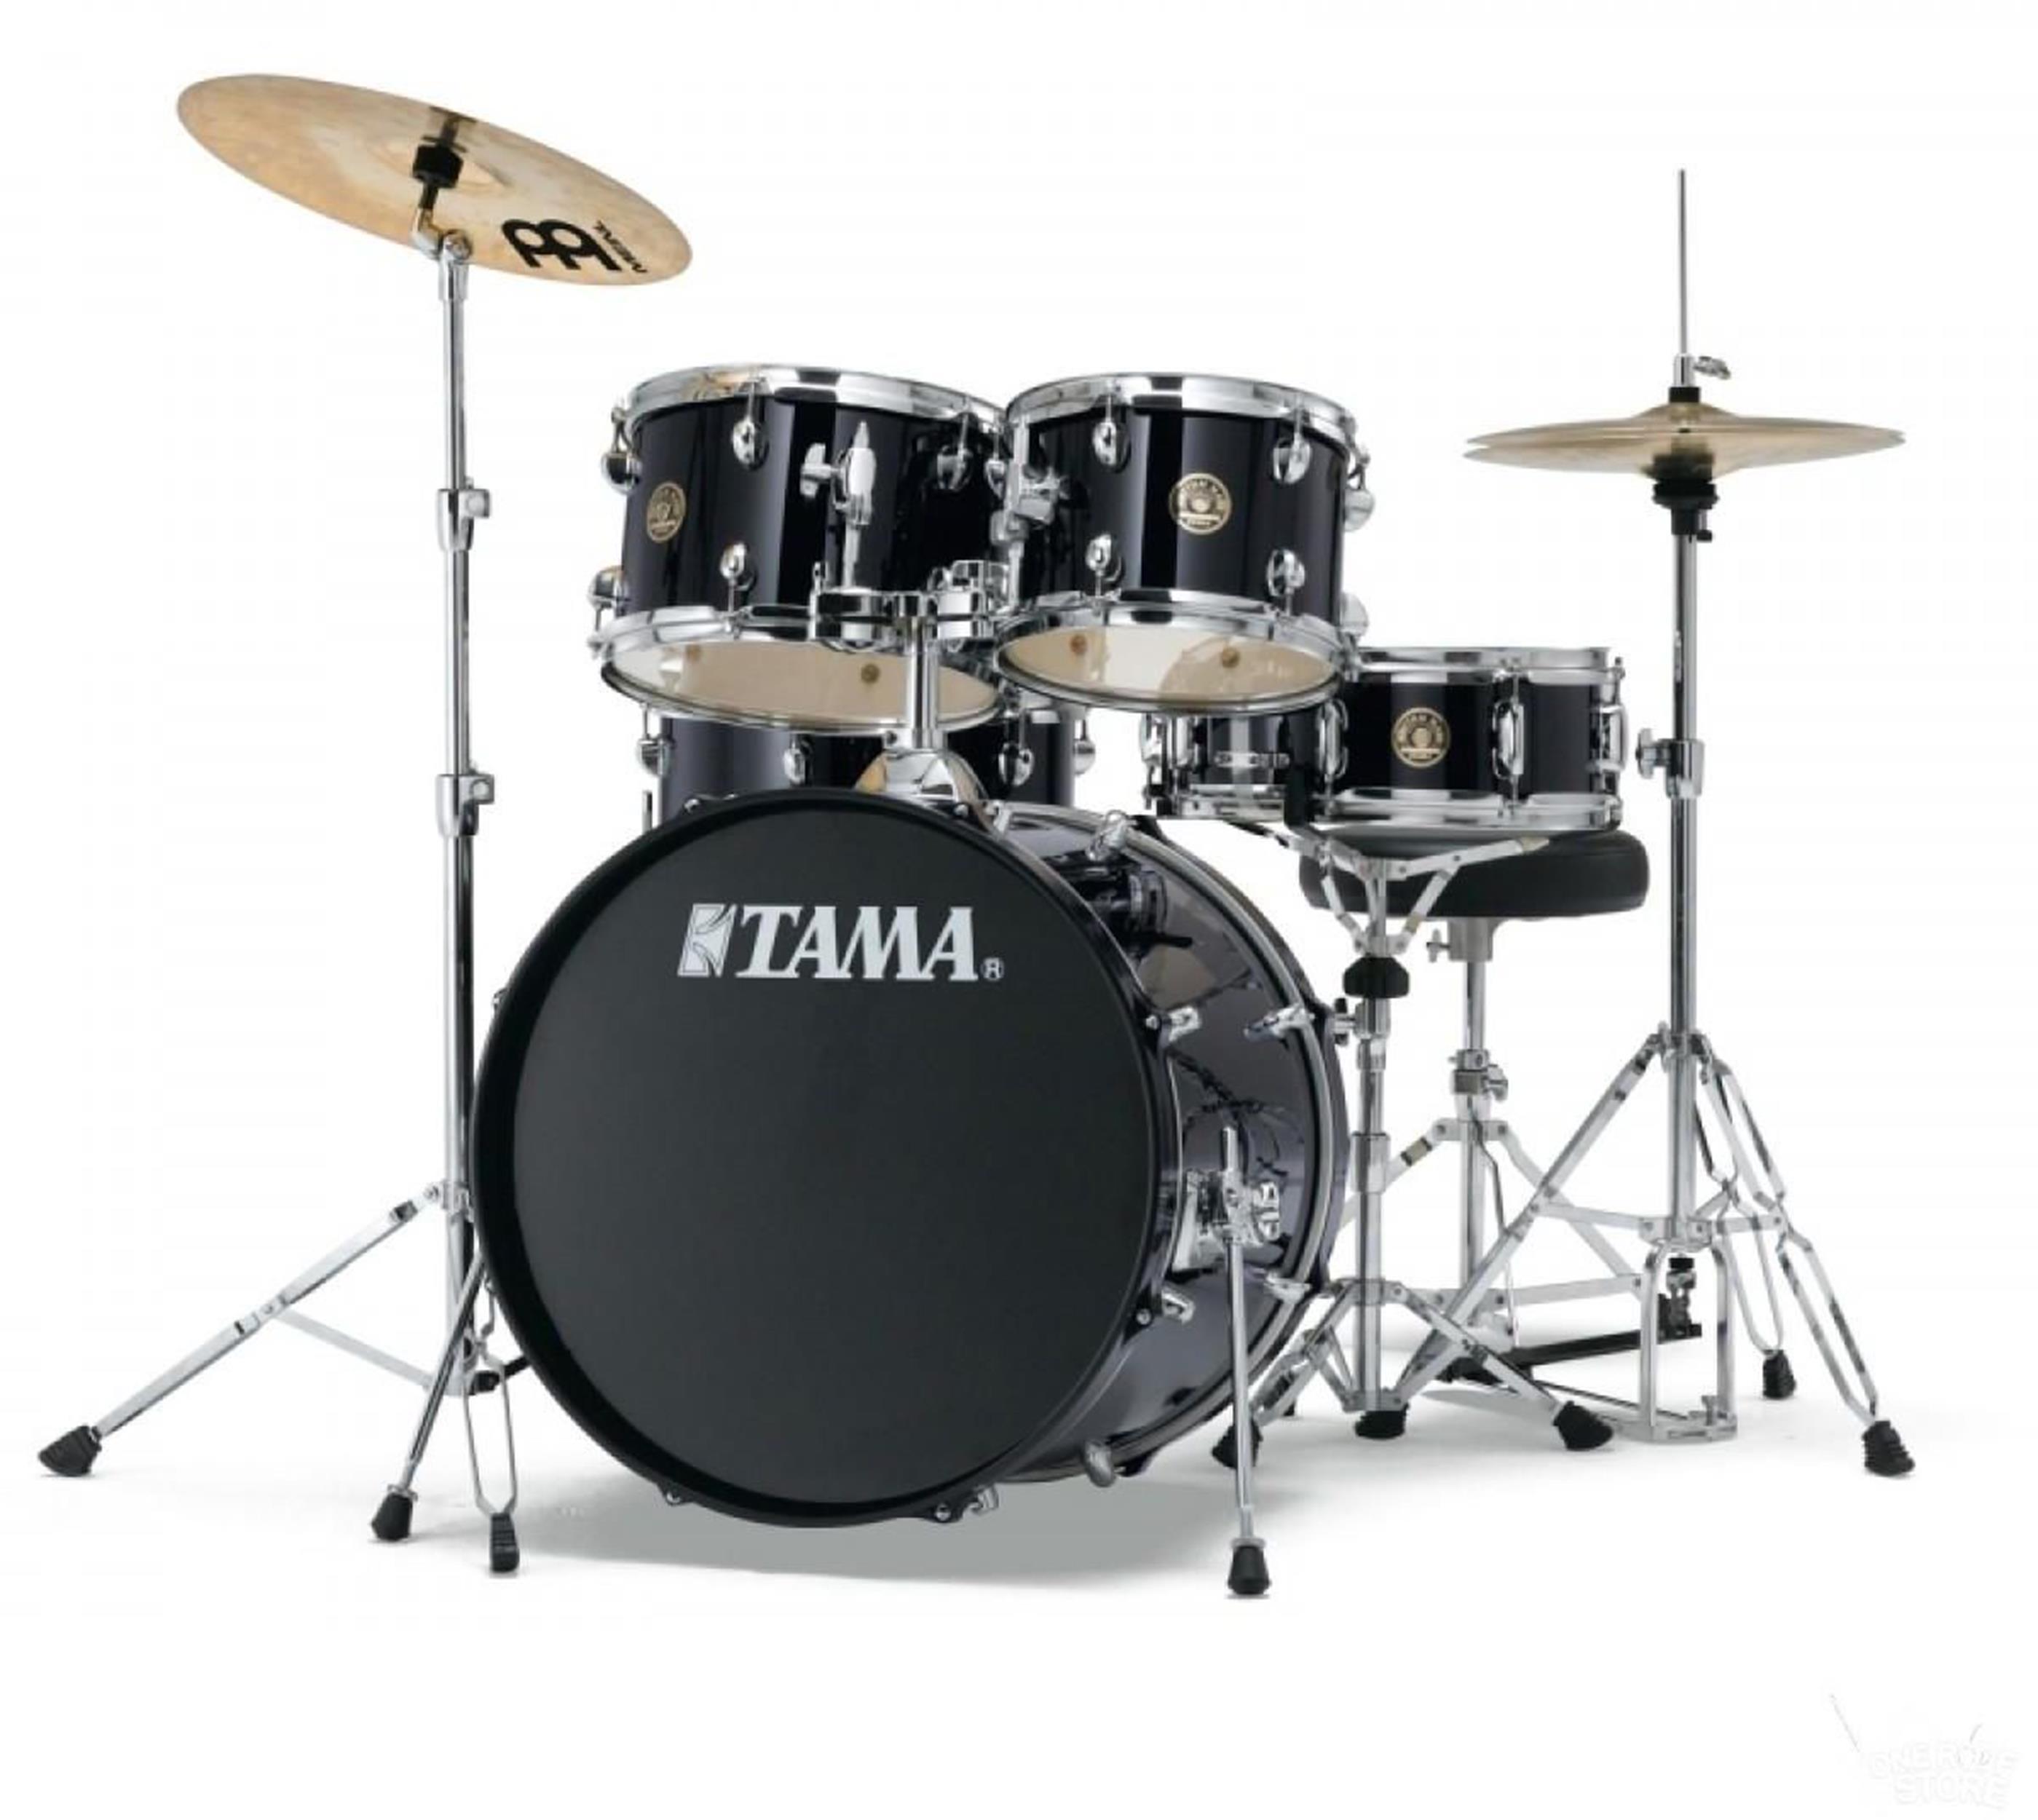 TAMA RM52KH6C-CCM - batteria completa + piatti - finitura Charcoal Mist